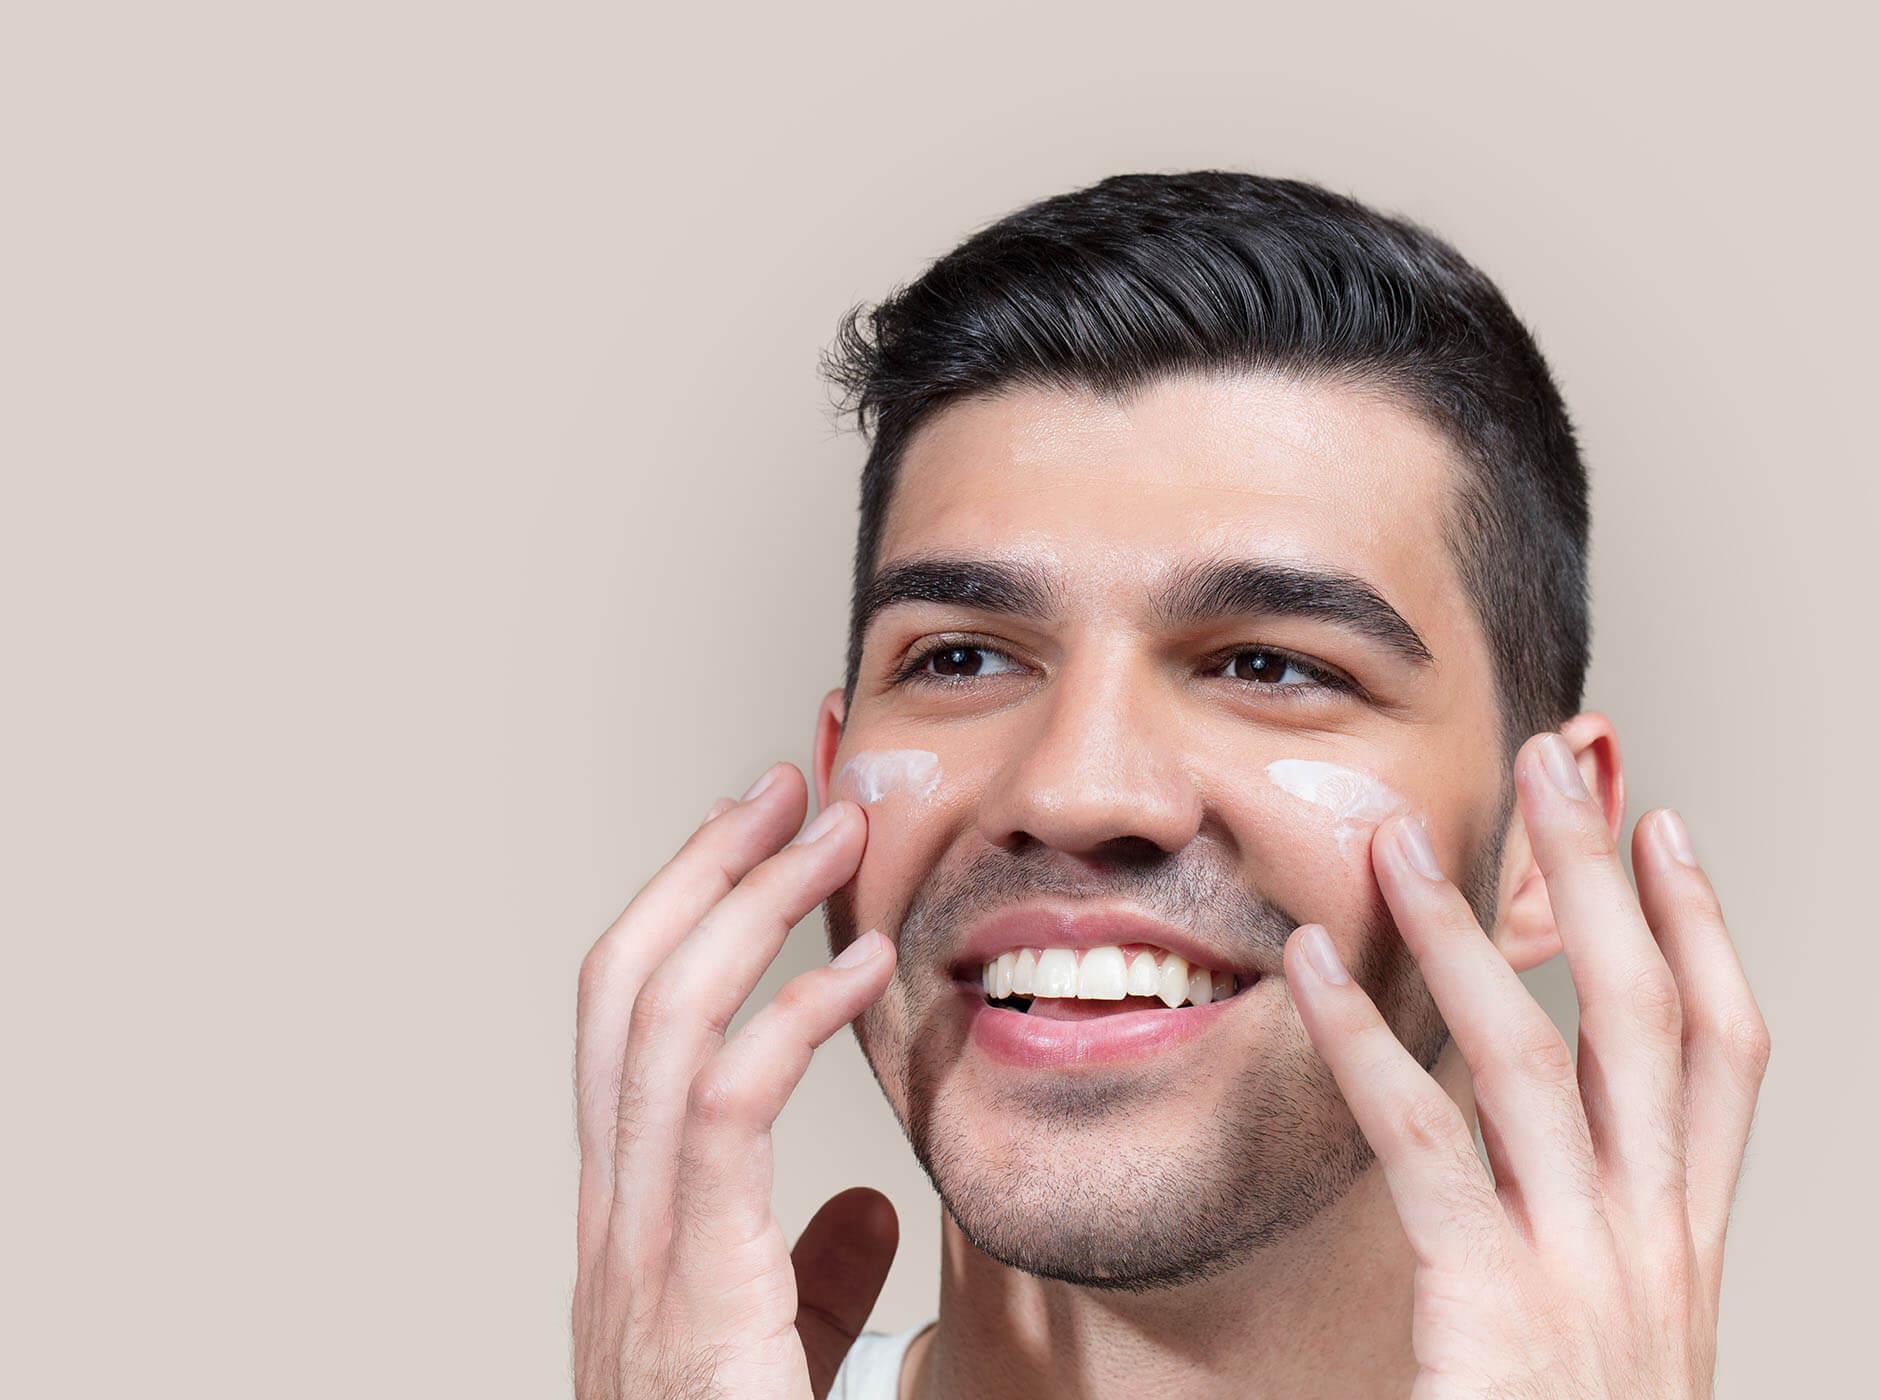 Man putting cream on his face.